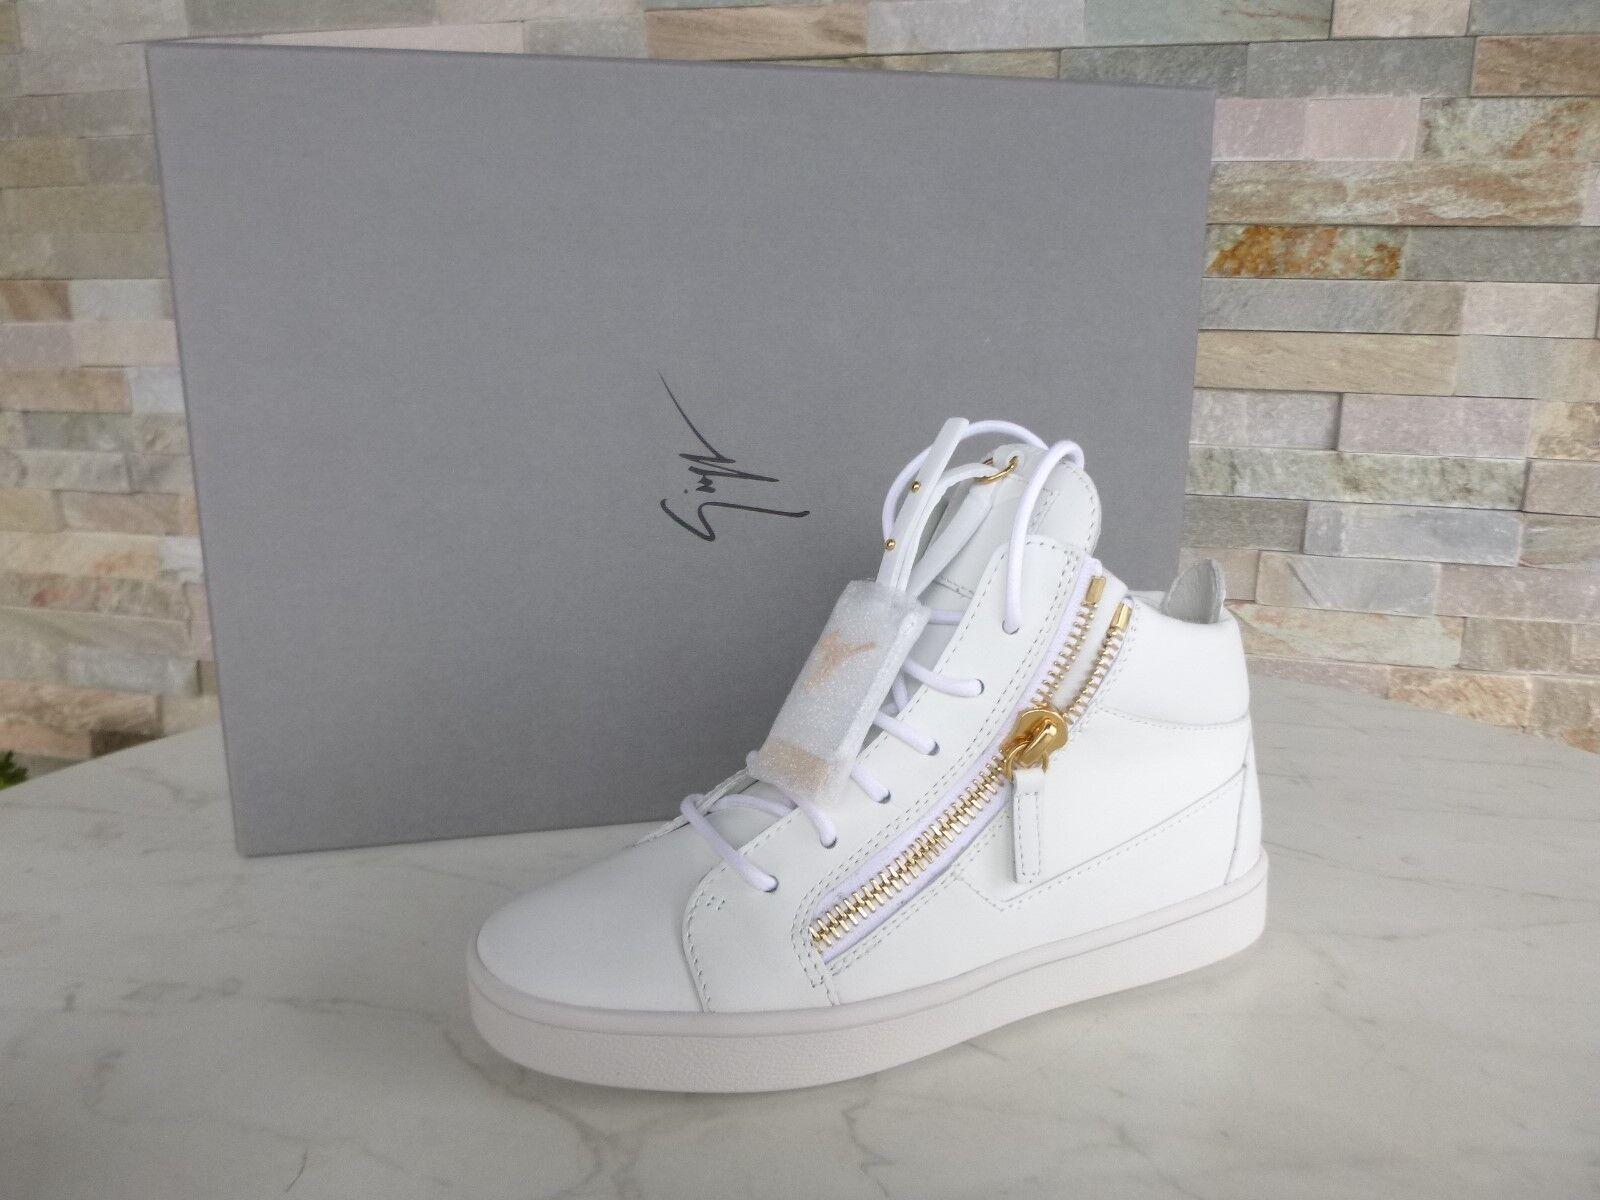 LUSSO 35 Giuseppe Zanotti Design N. 35 LUSSO Sneakers High Top Scarpe Shoes NUOVO UVP 86bdb4